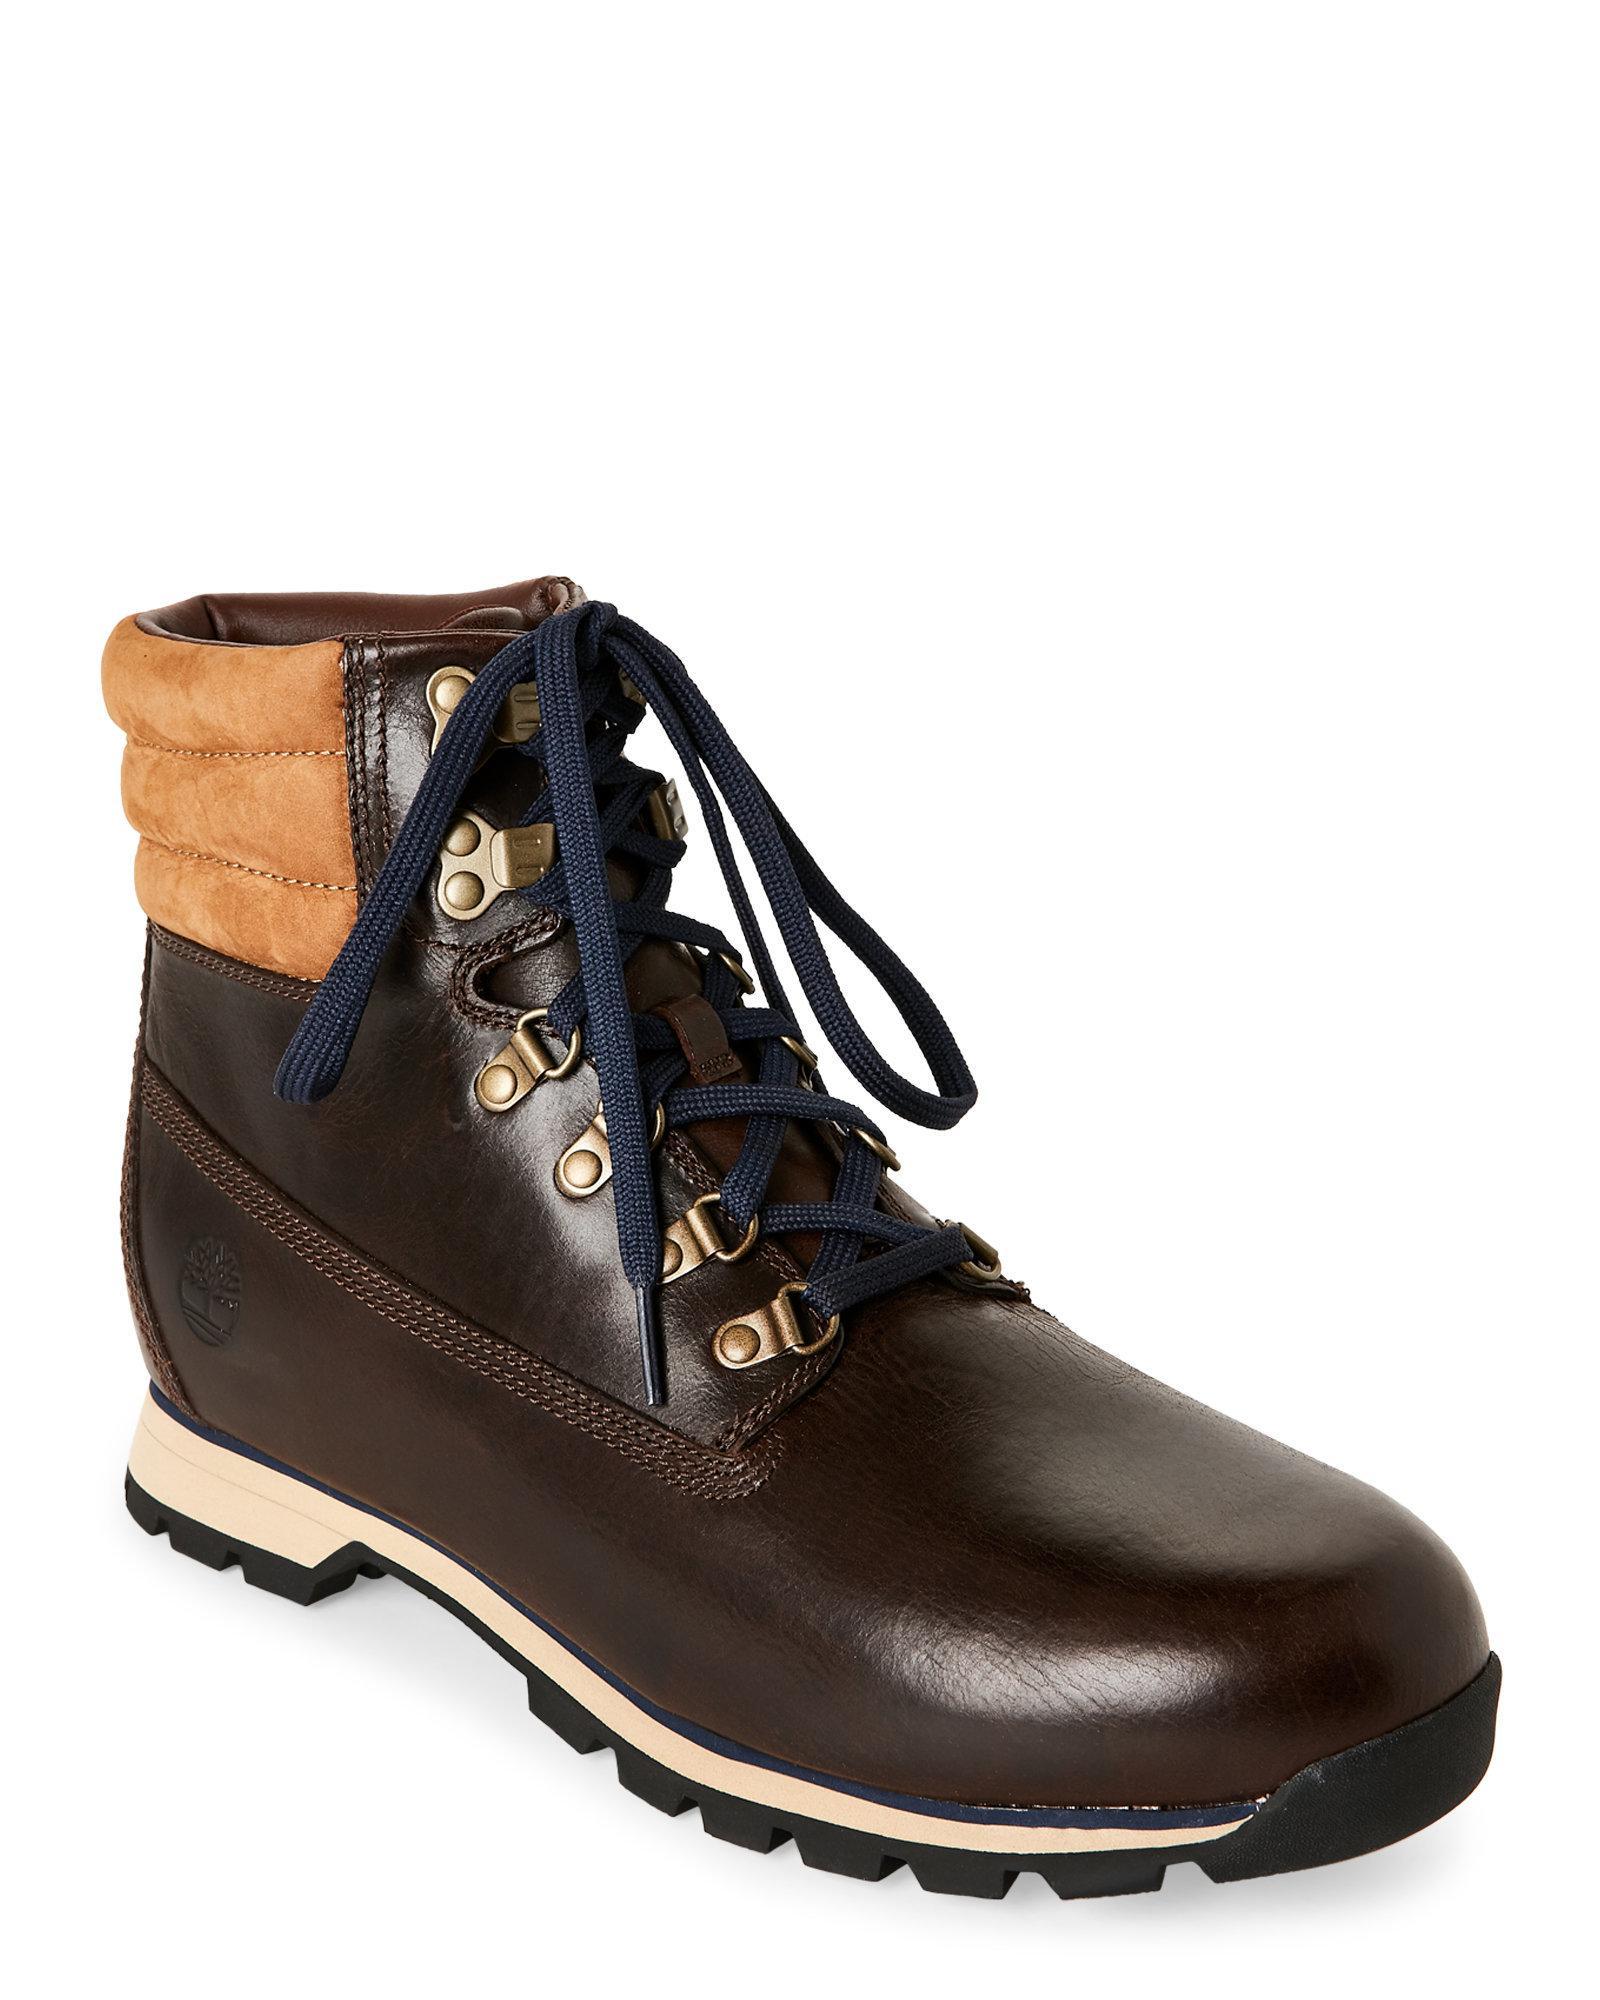 Men Timberland Hutchington Hiker Boots Dark Brown